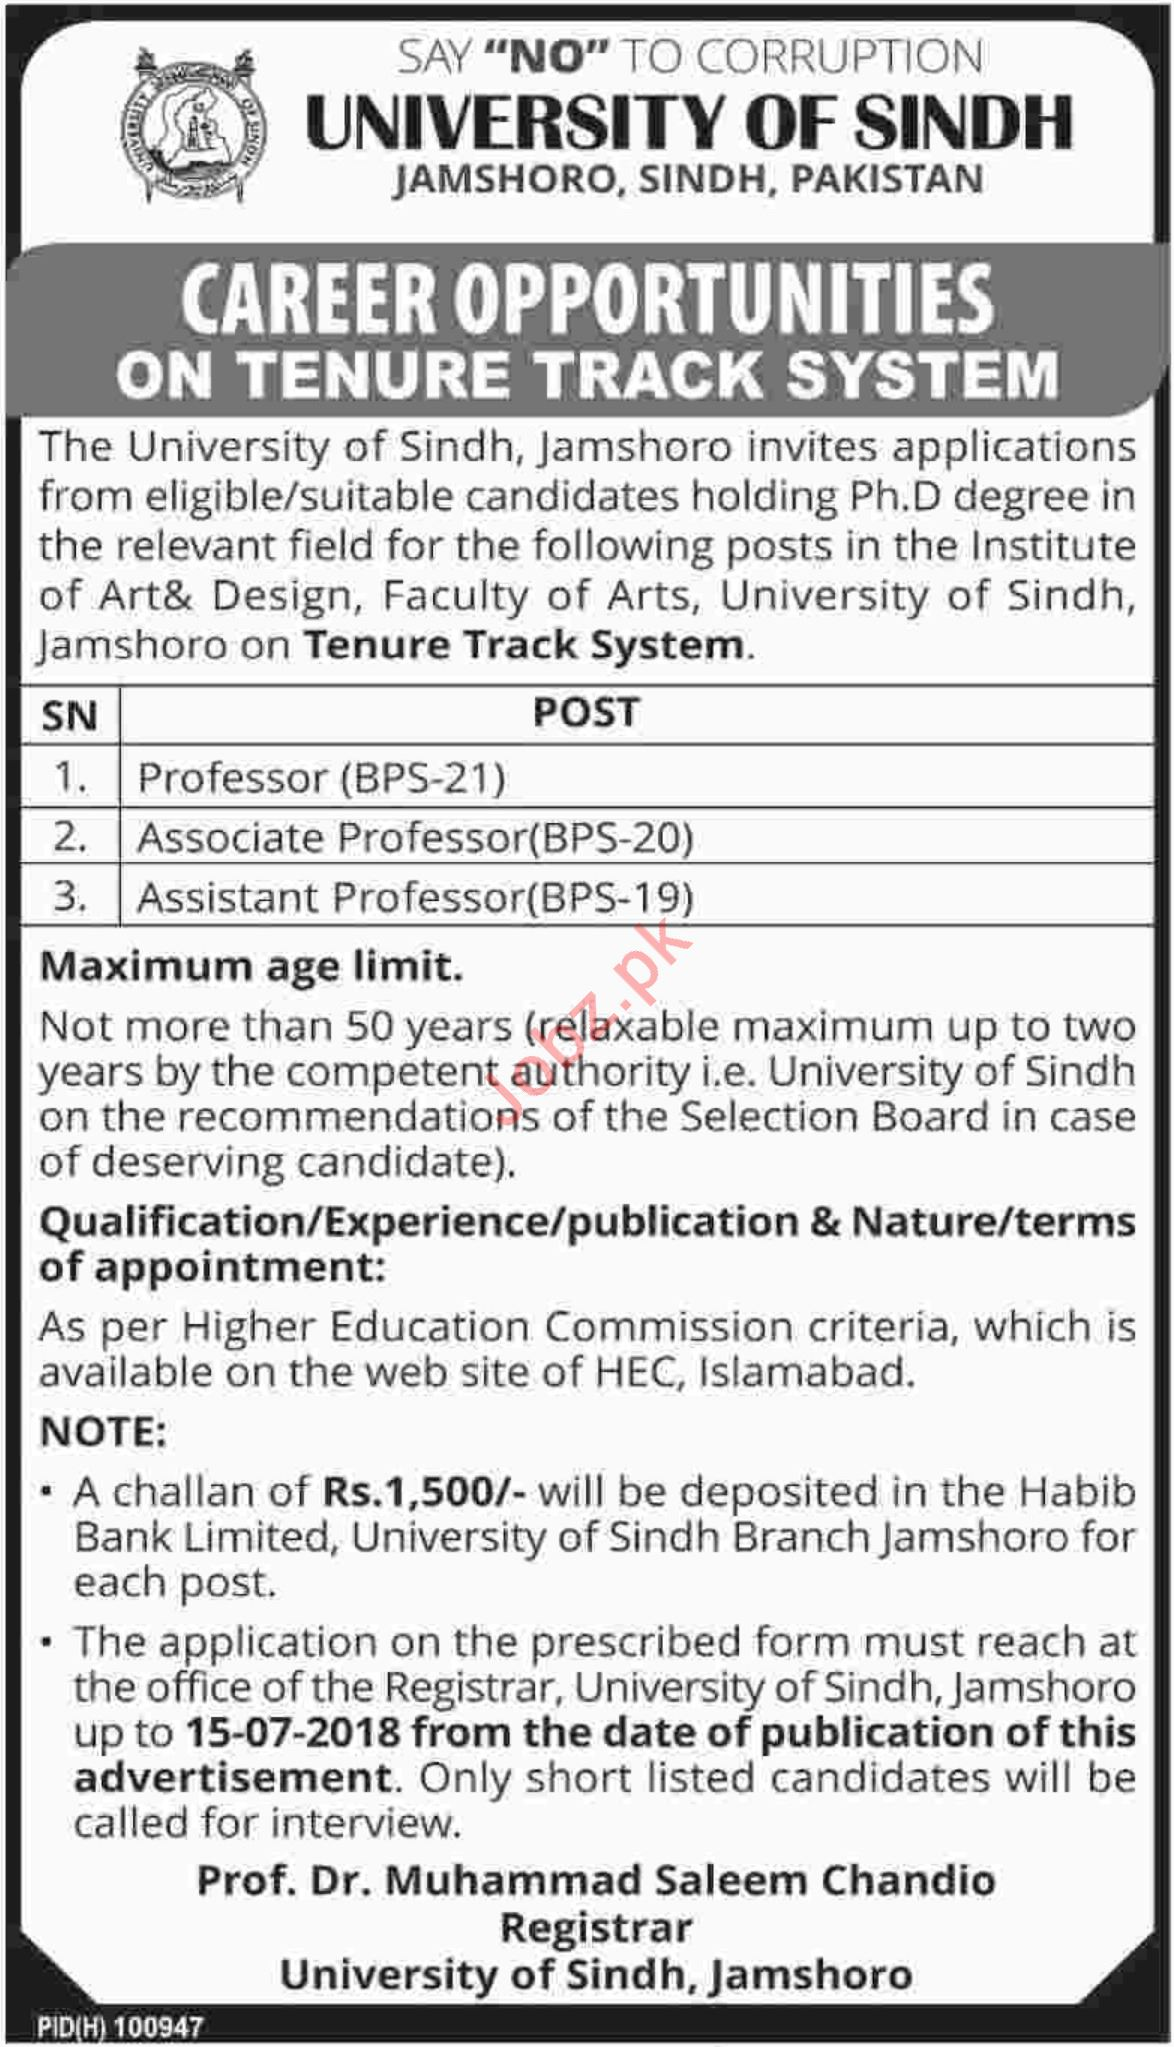 University of Sindh Jamshoro Jobs 2018 for Professors